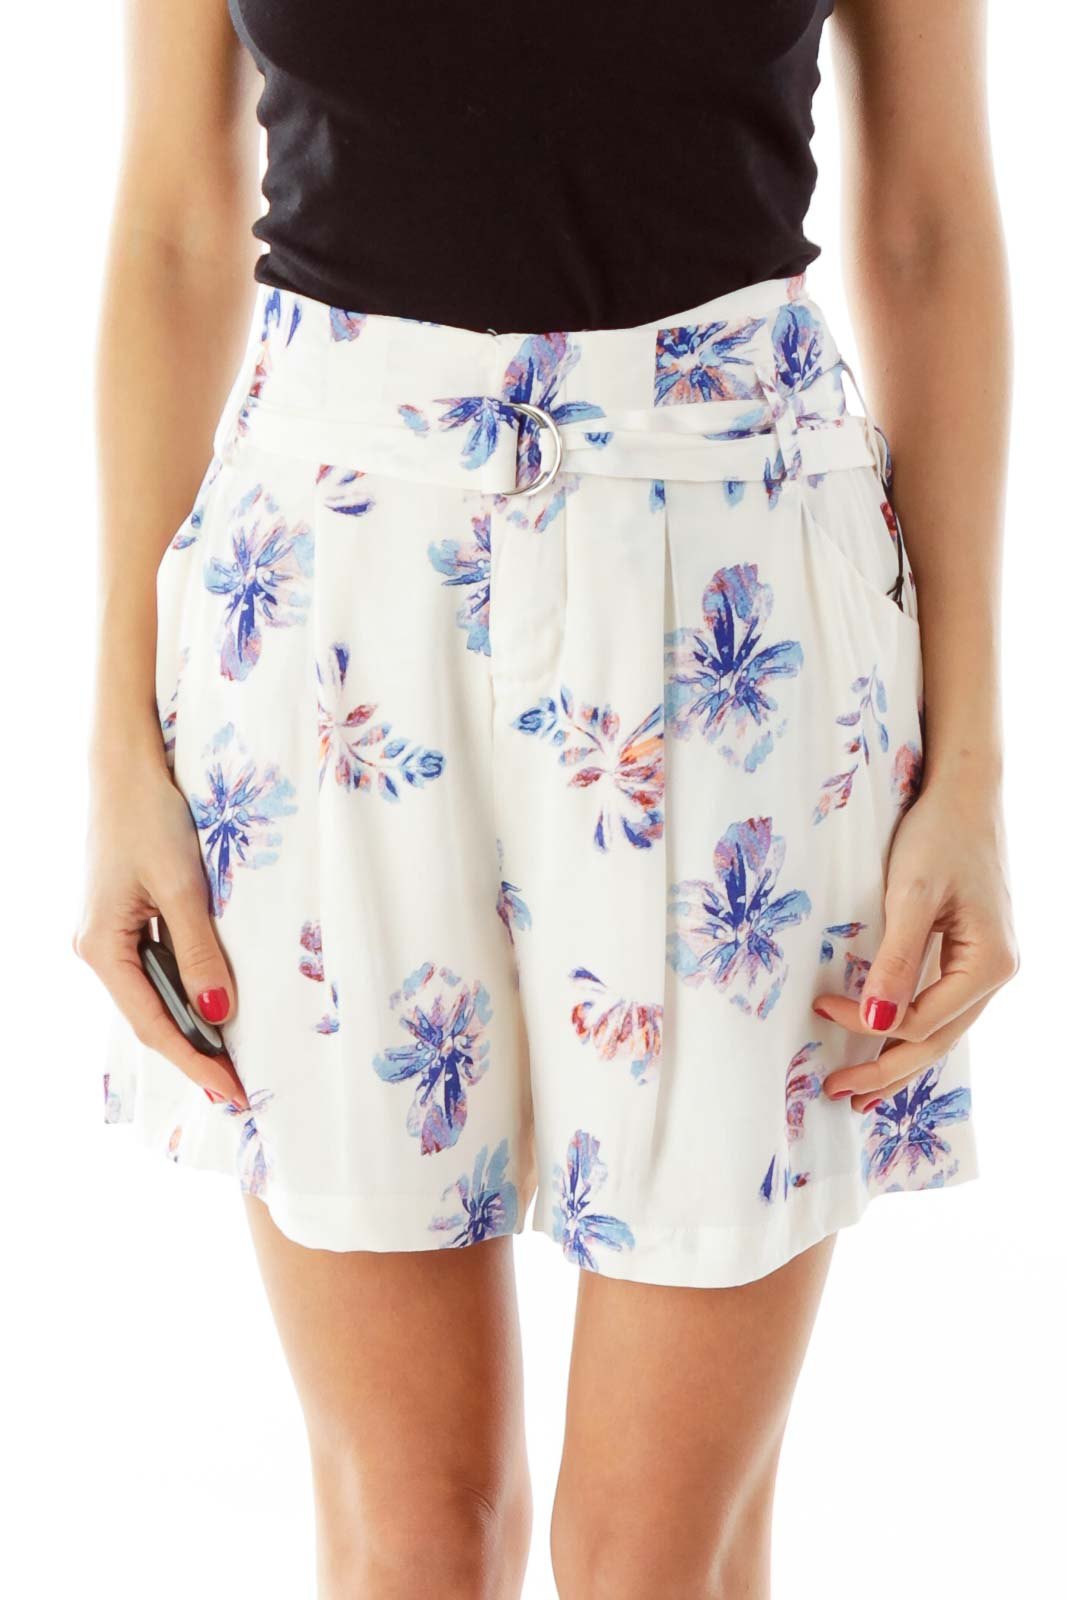 Pink Floral High Waisted Skirt